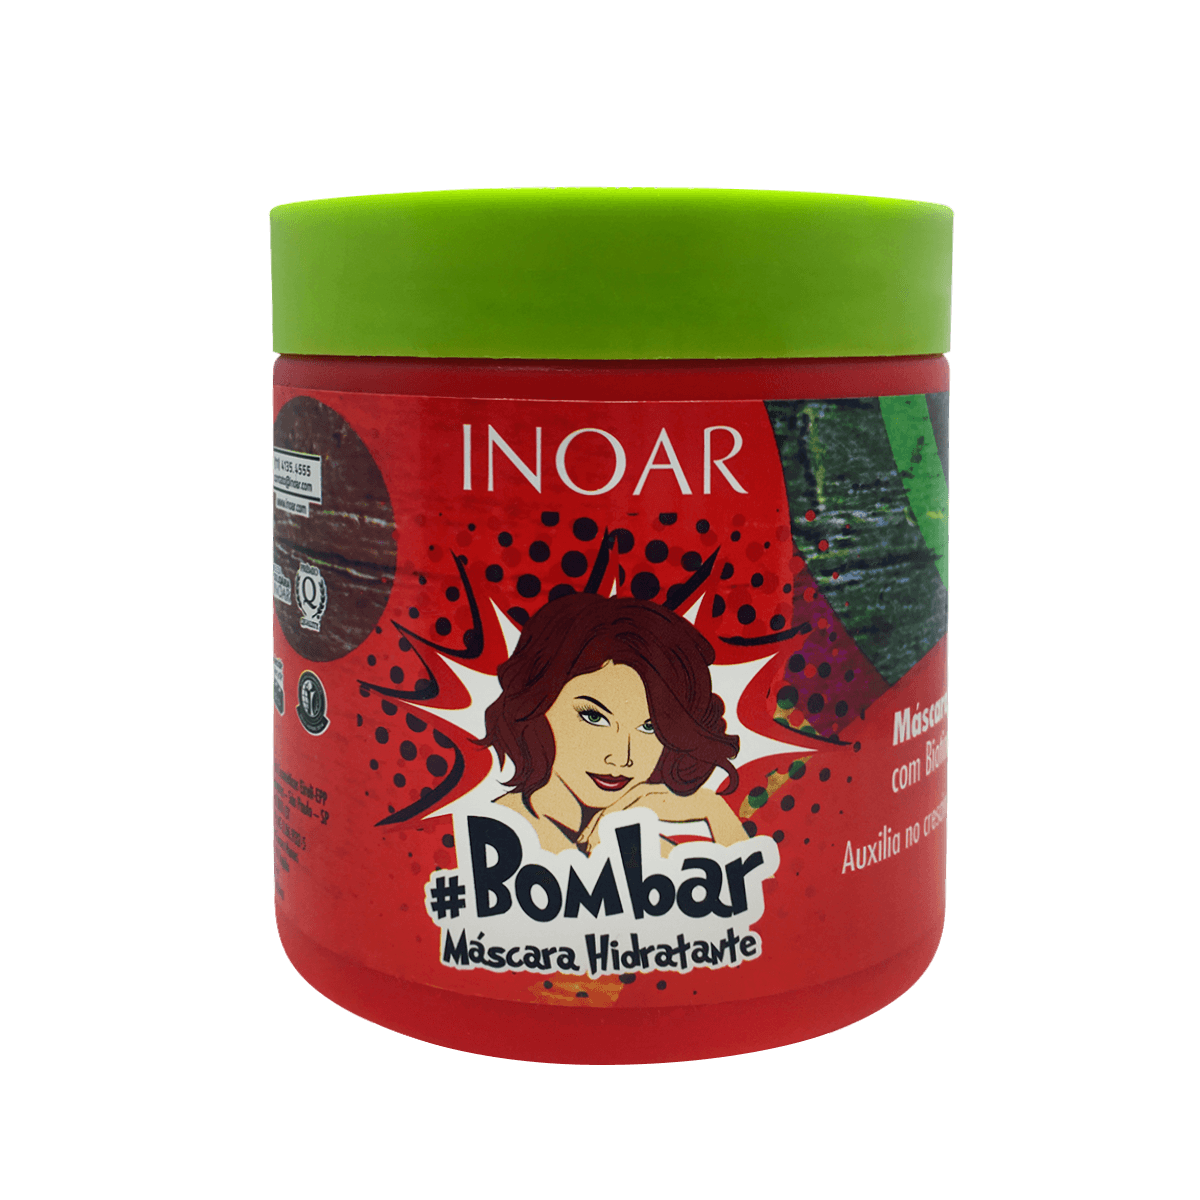 Inoar Mascara Hidratante Bombar - 500g